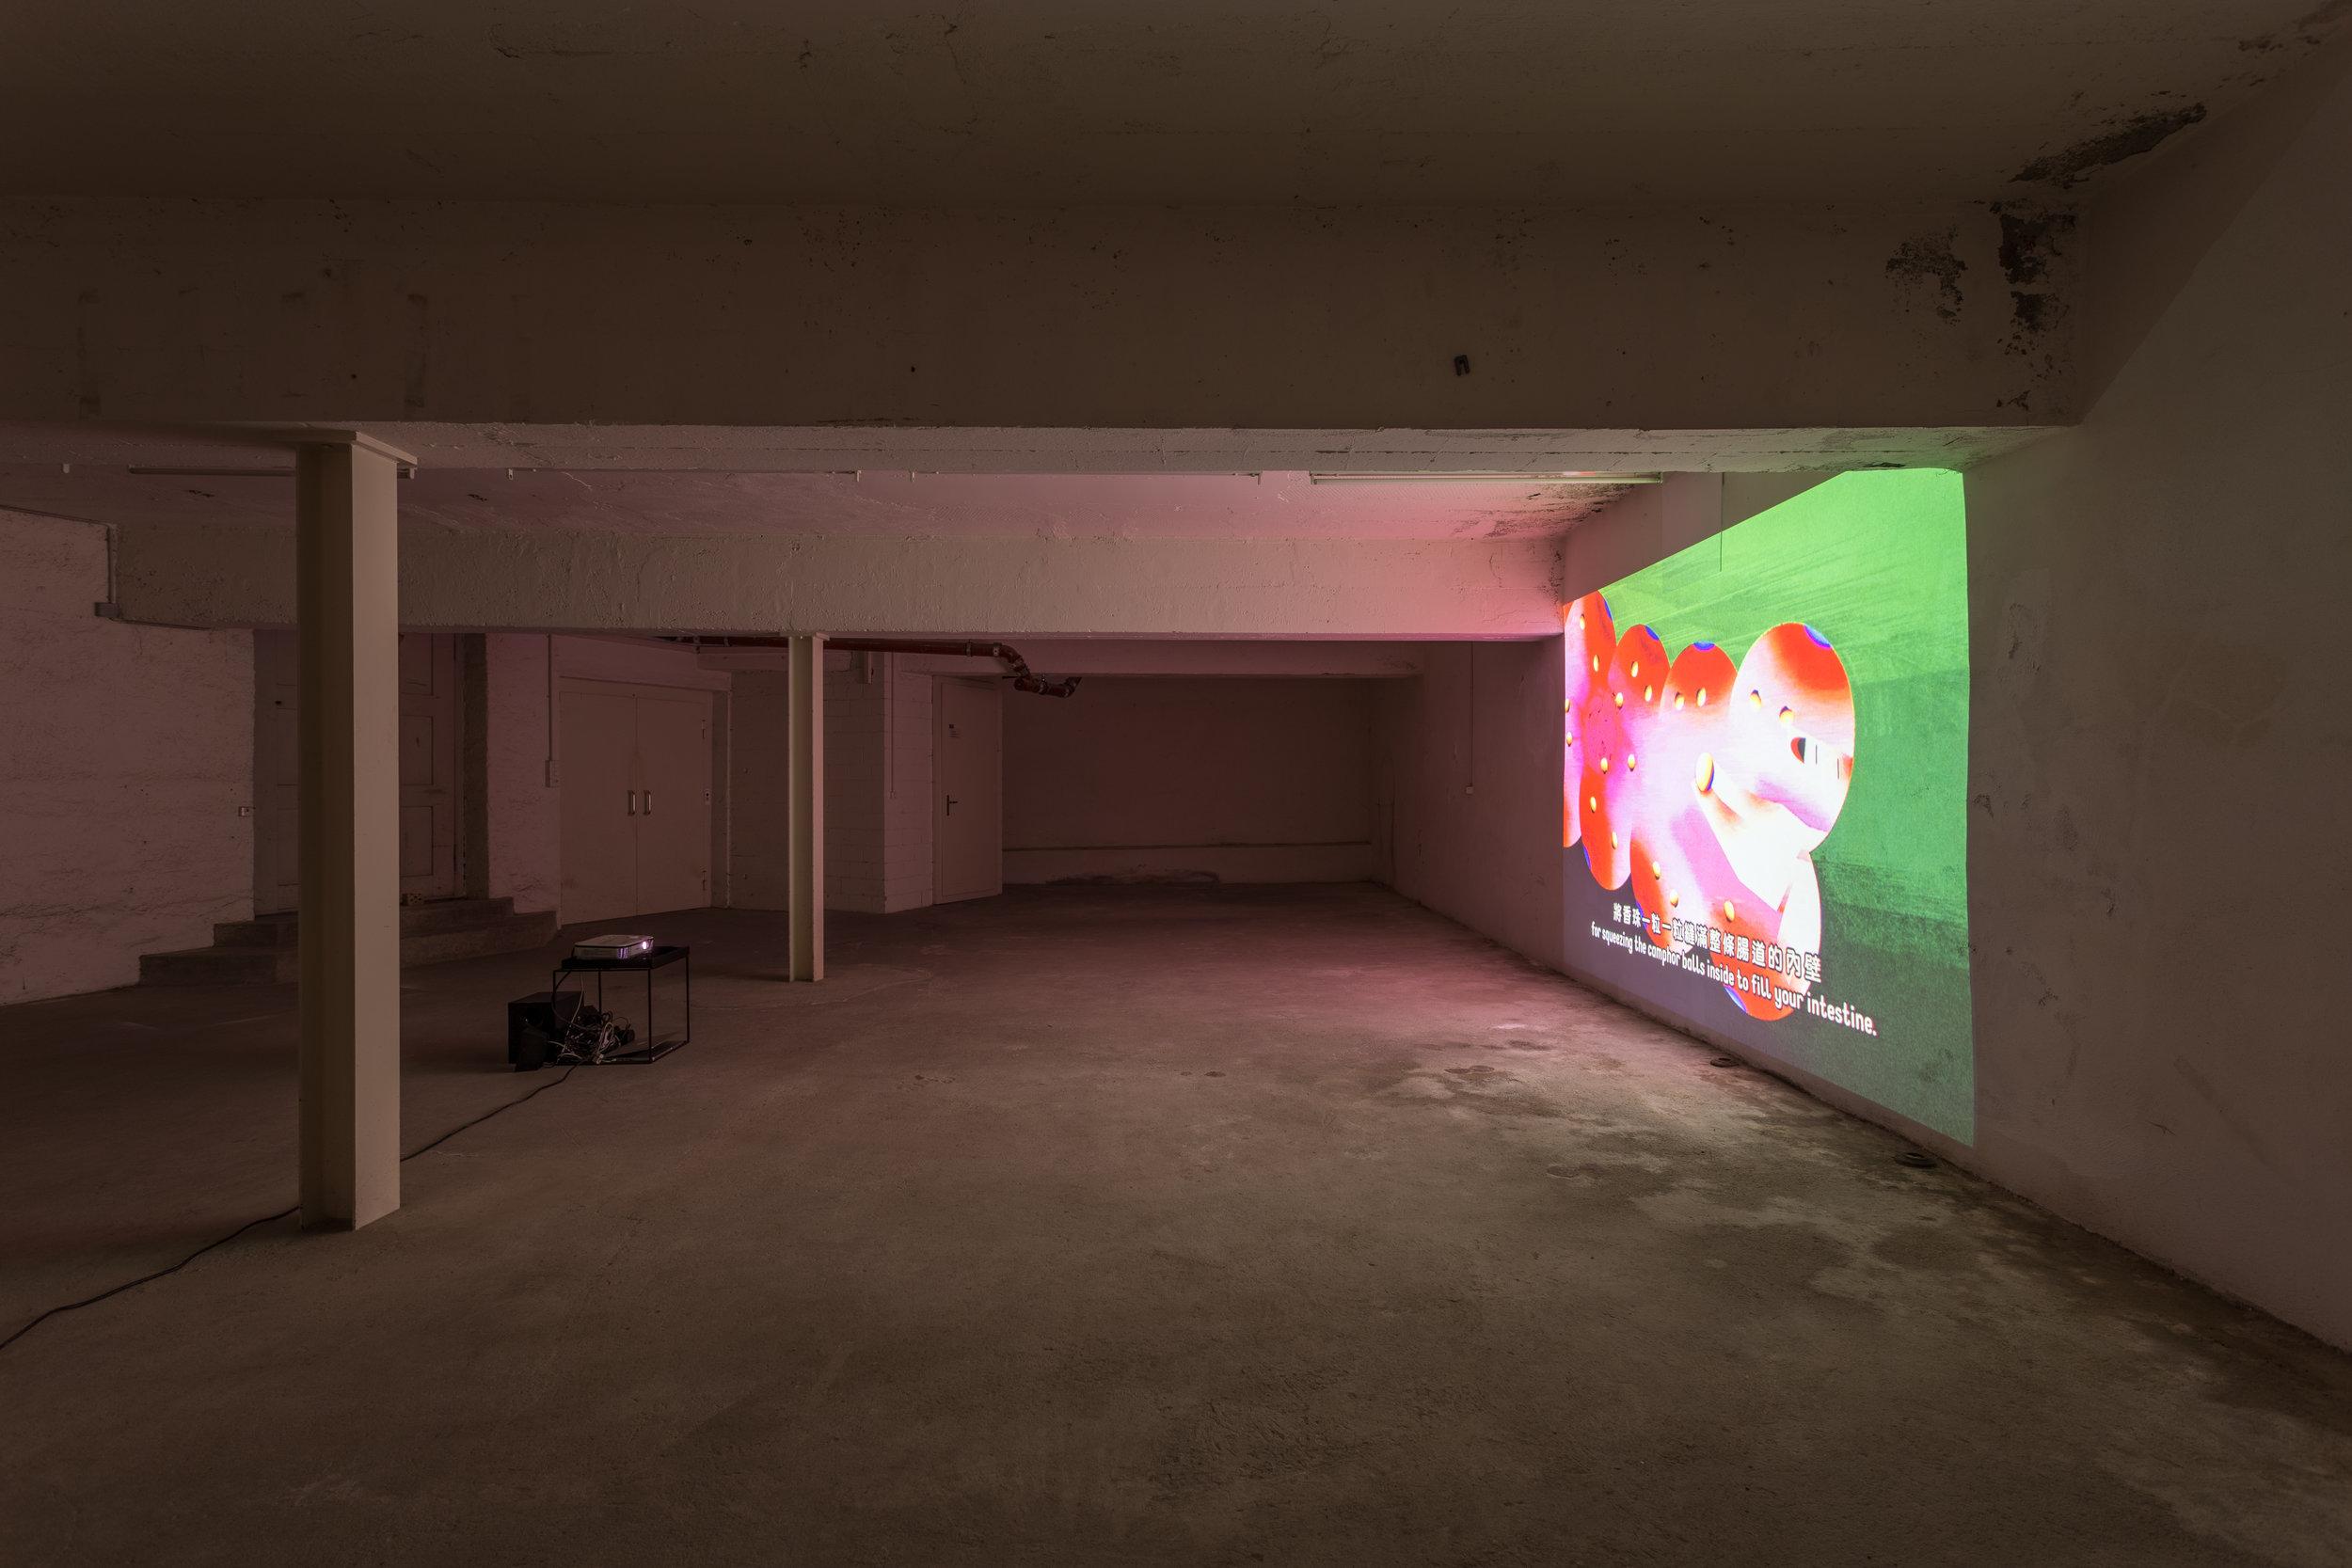 Installation view, 5. Donatella Bernardi & Wong Ping Wong Ping,  Jungle of Desire, 2015, single channel video animation, 6min50sec. Photo: Killian Bannwart